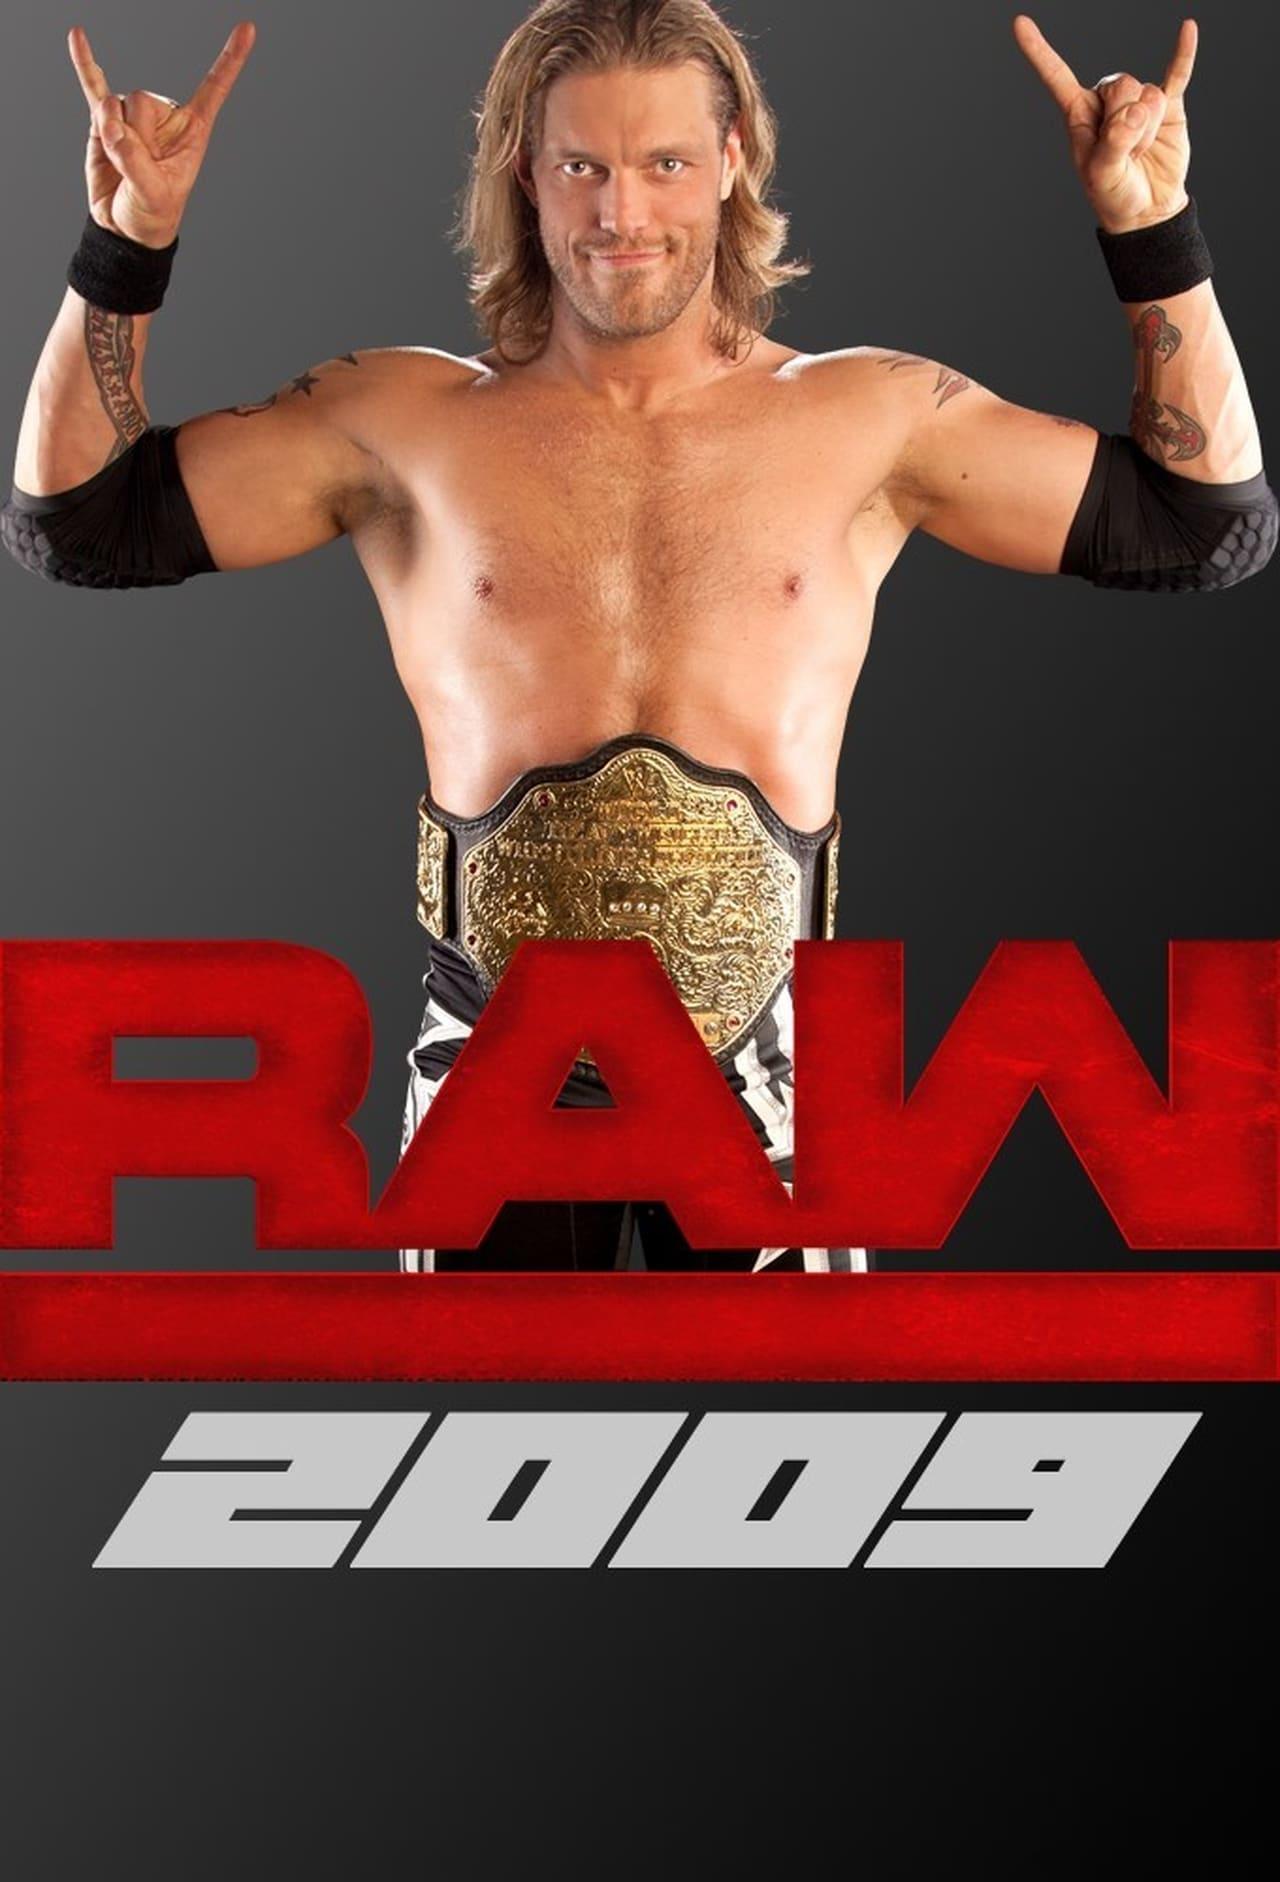 Putlocker Wwe Raw Season 17 (2009)